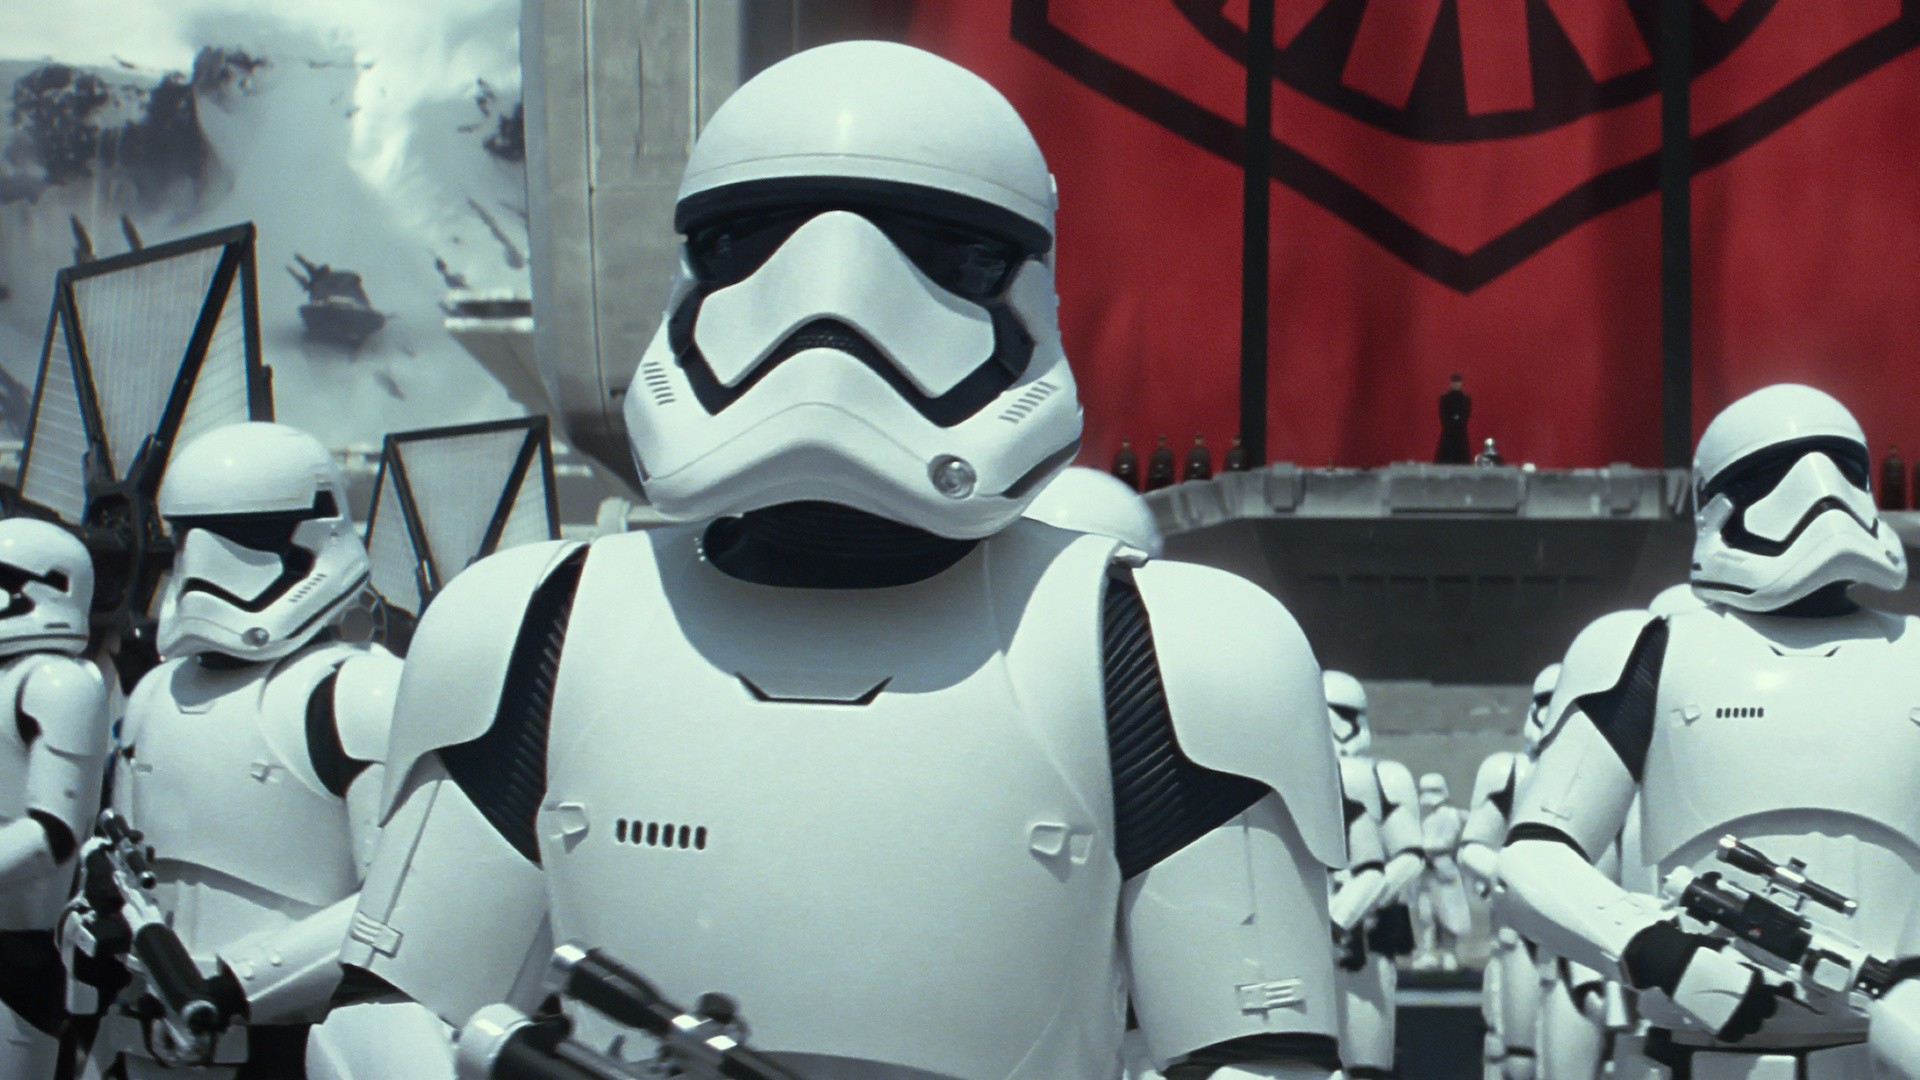 Star Wars 7 Stormtrooper Wallpaper 62 Images